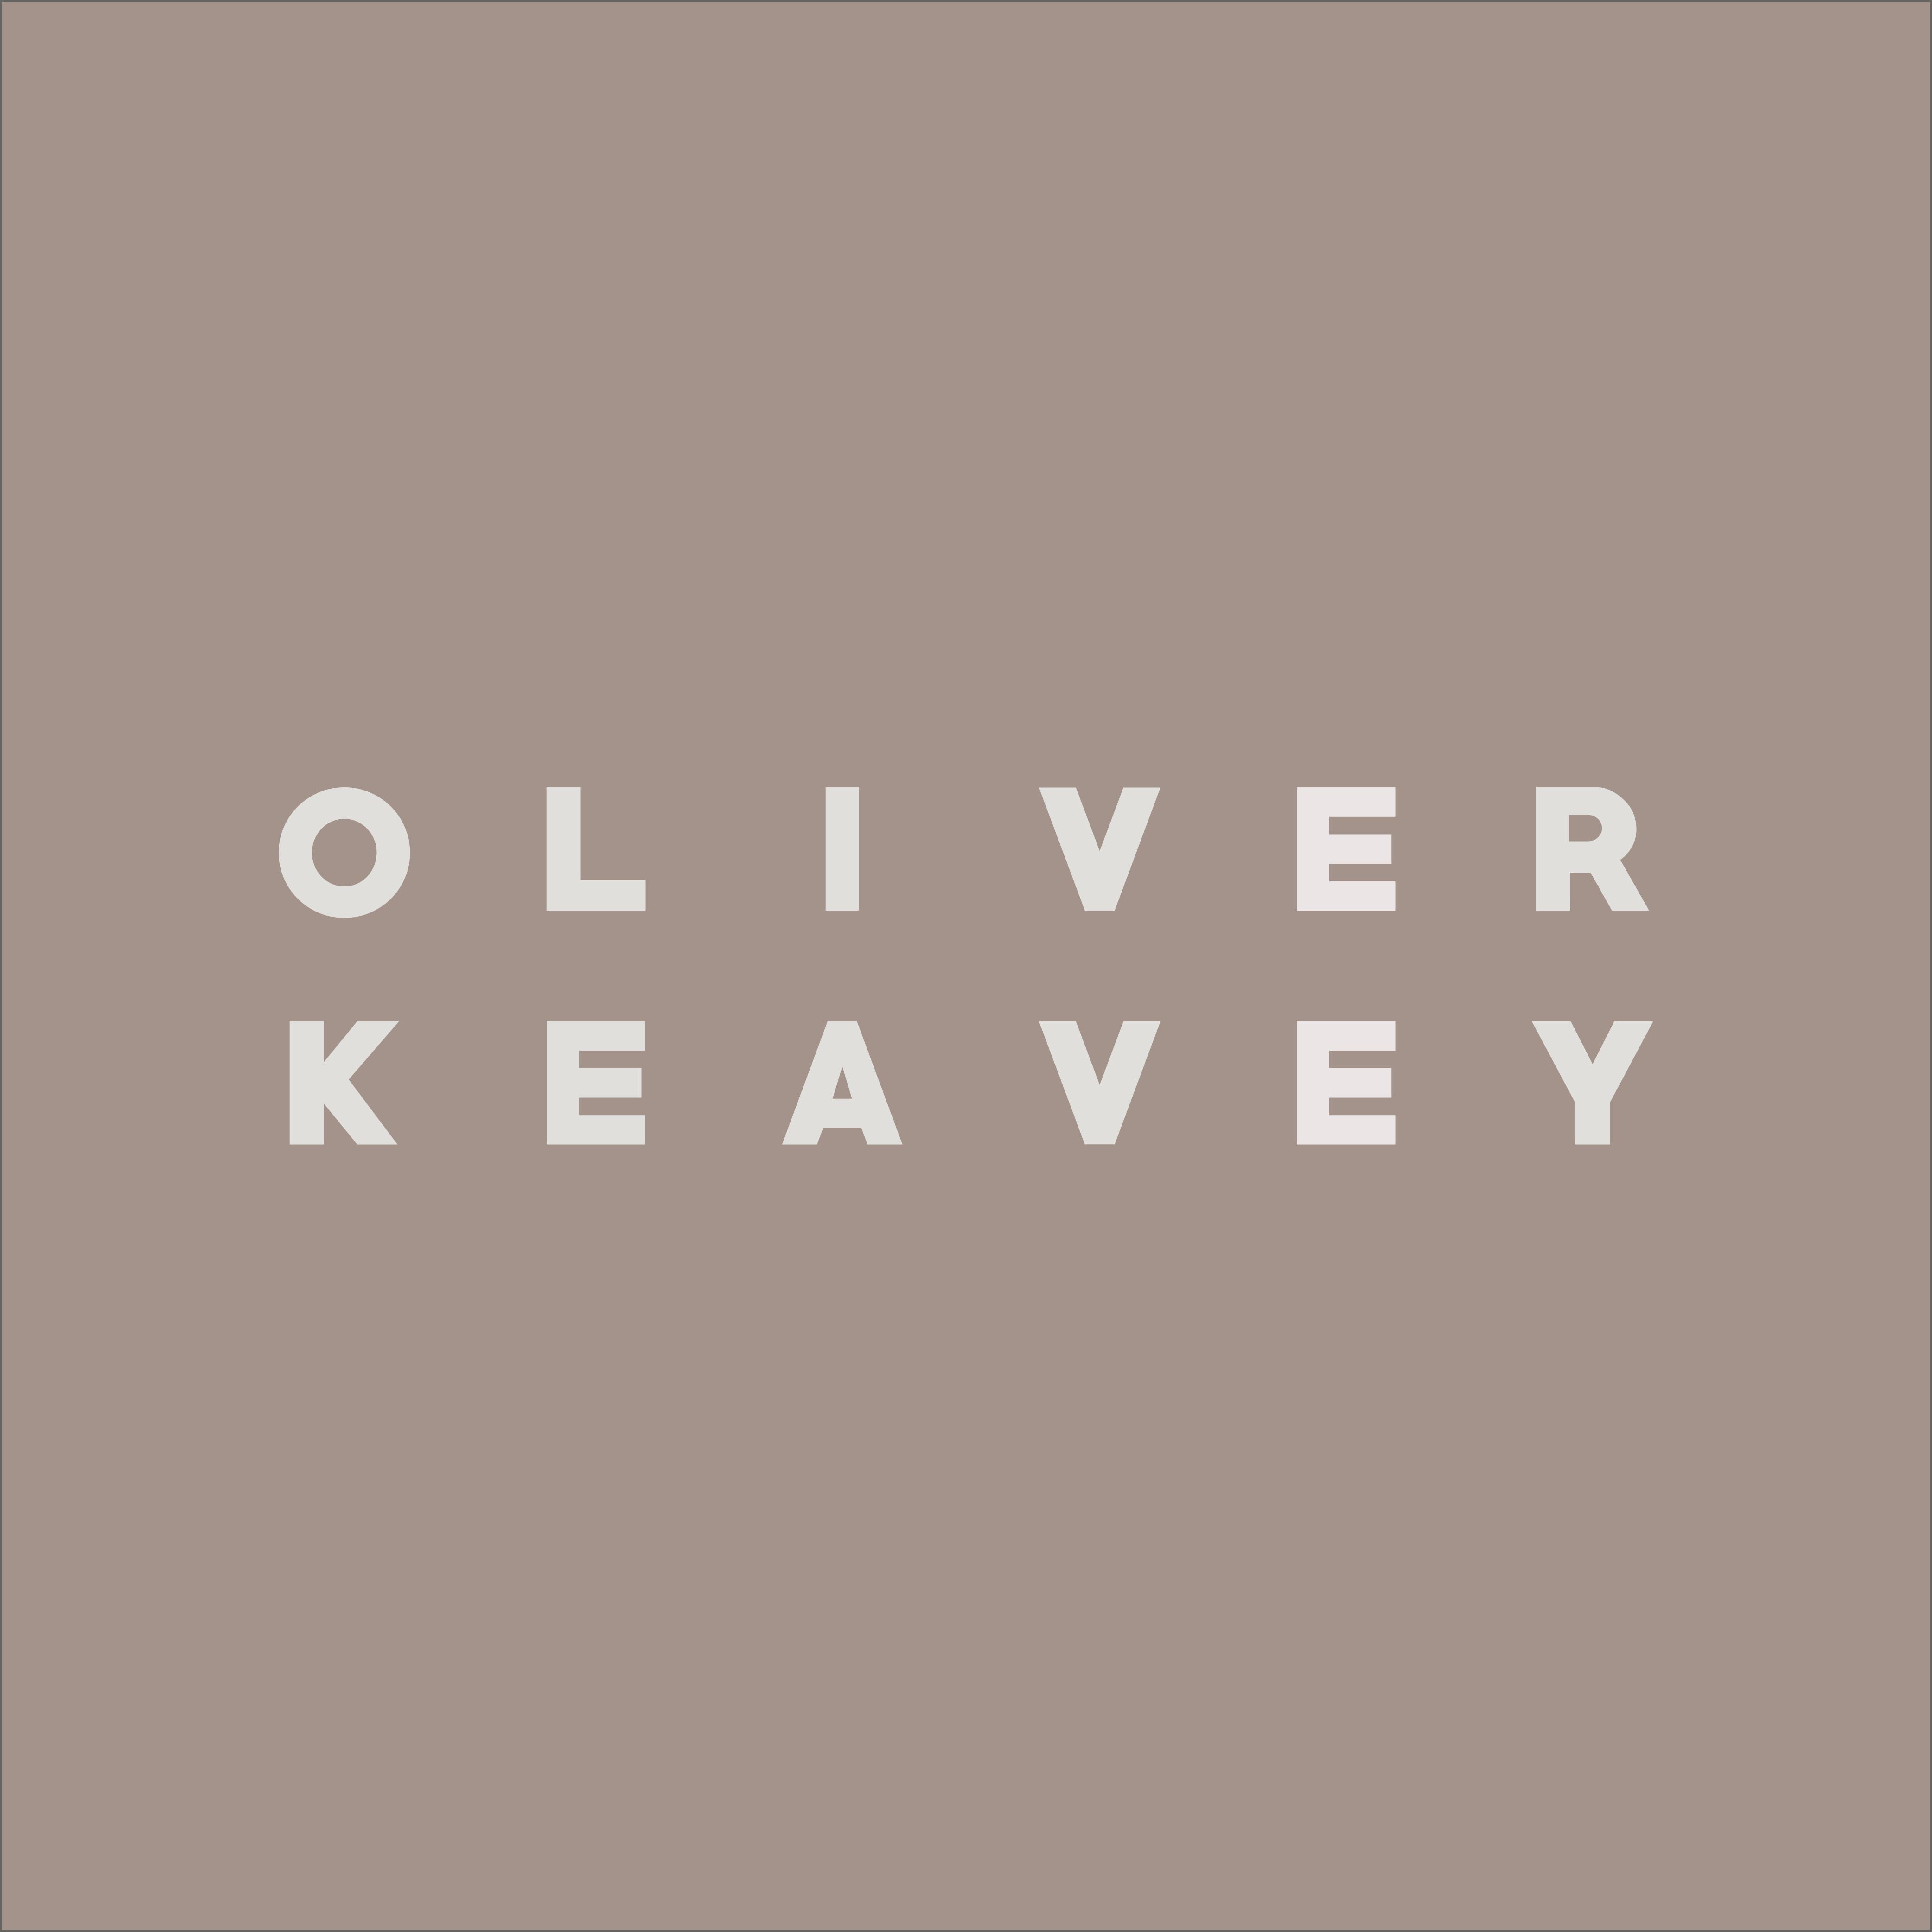 0keavey Photography & Design